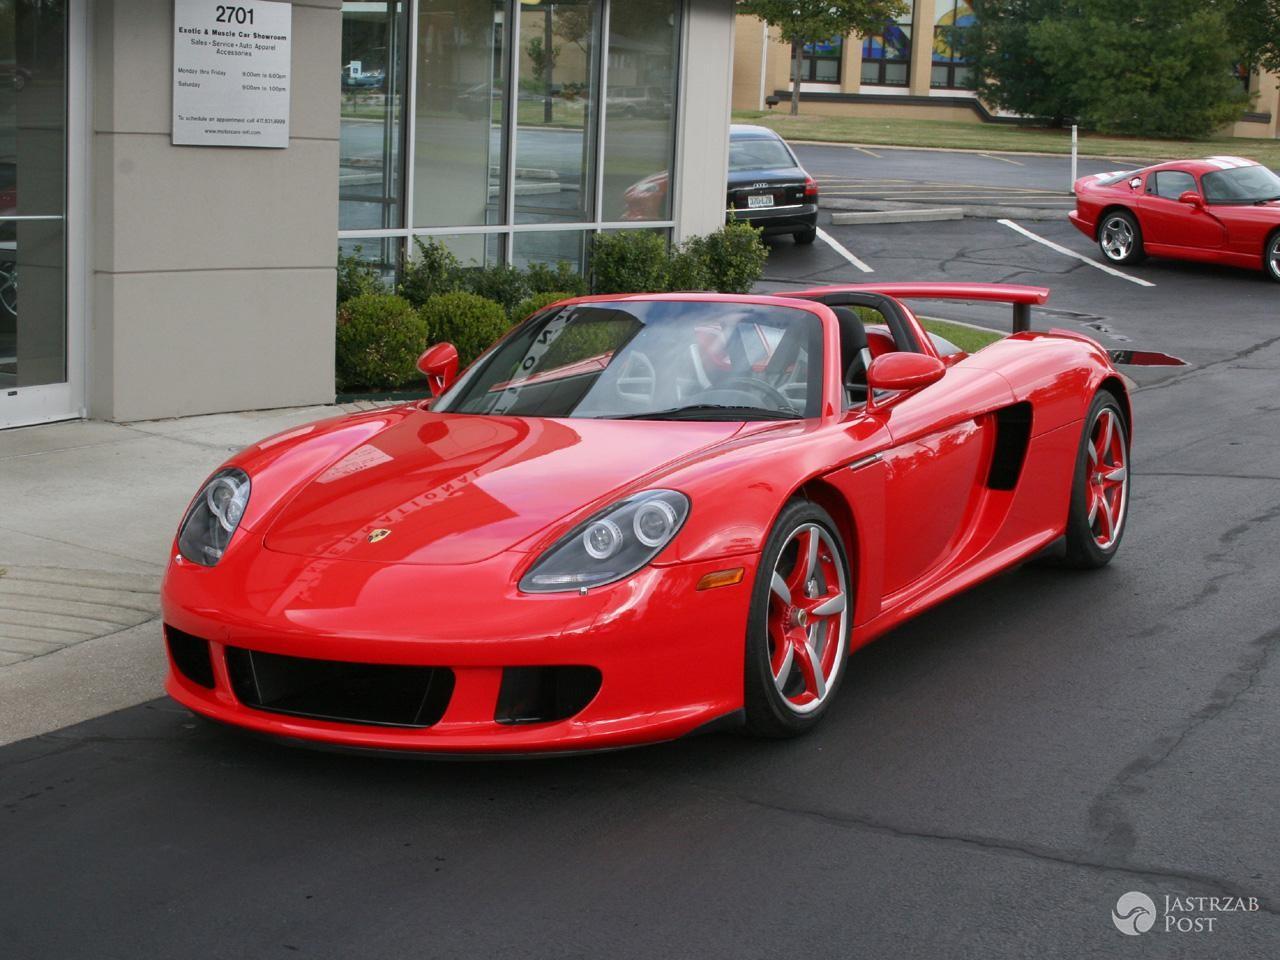 Porsche Carrera GT - samochód, którym jechał Paul Walker